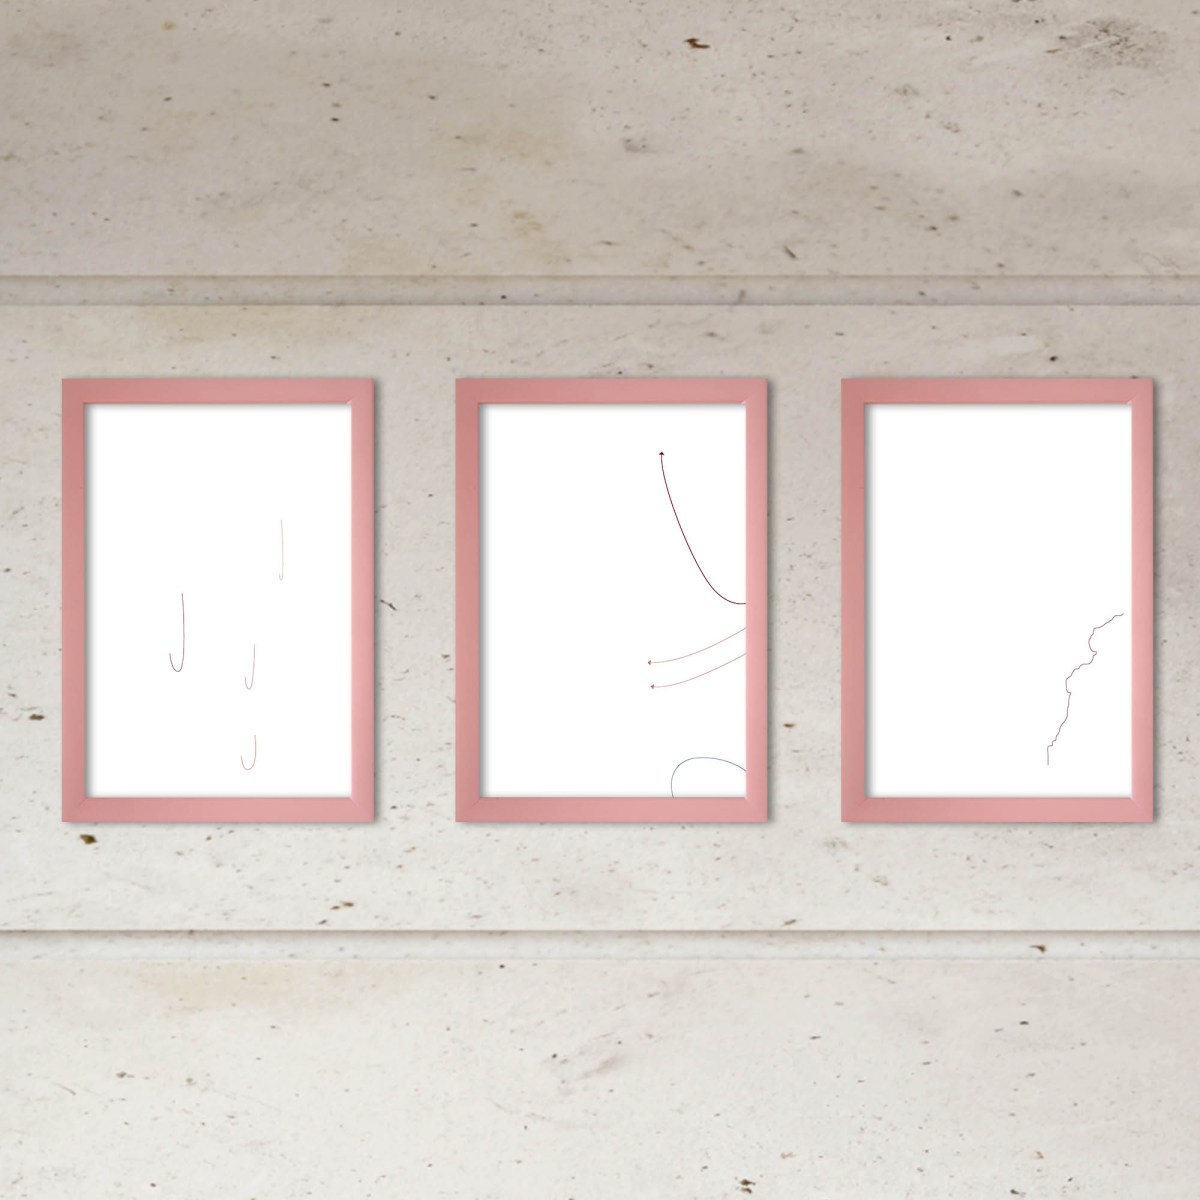 Fernanda Barreto, dibujo digital, las cosas infinitas #16 en espacio